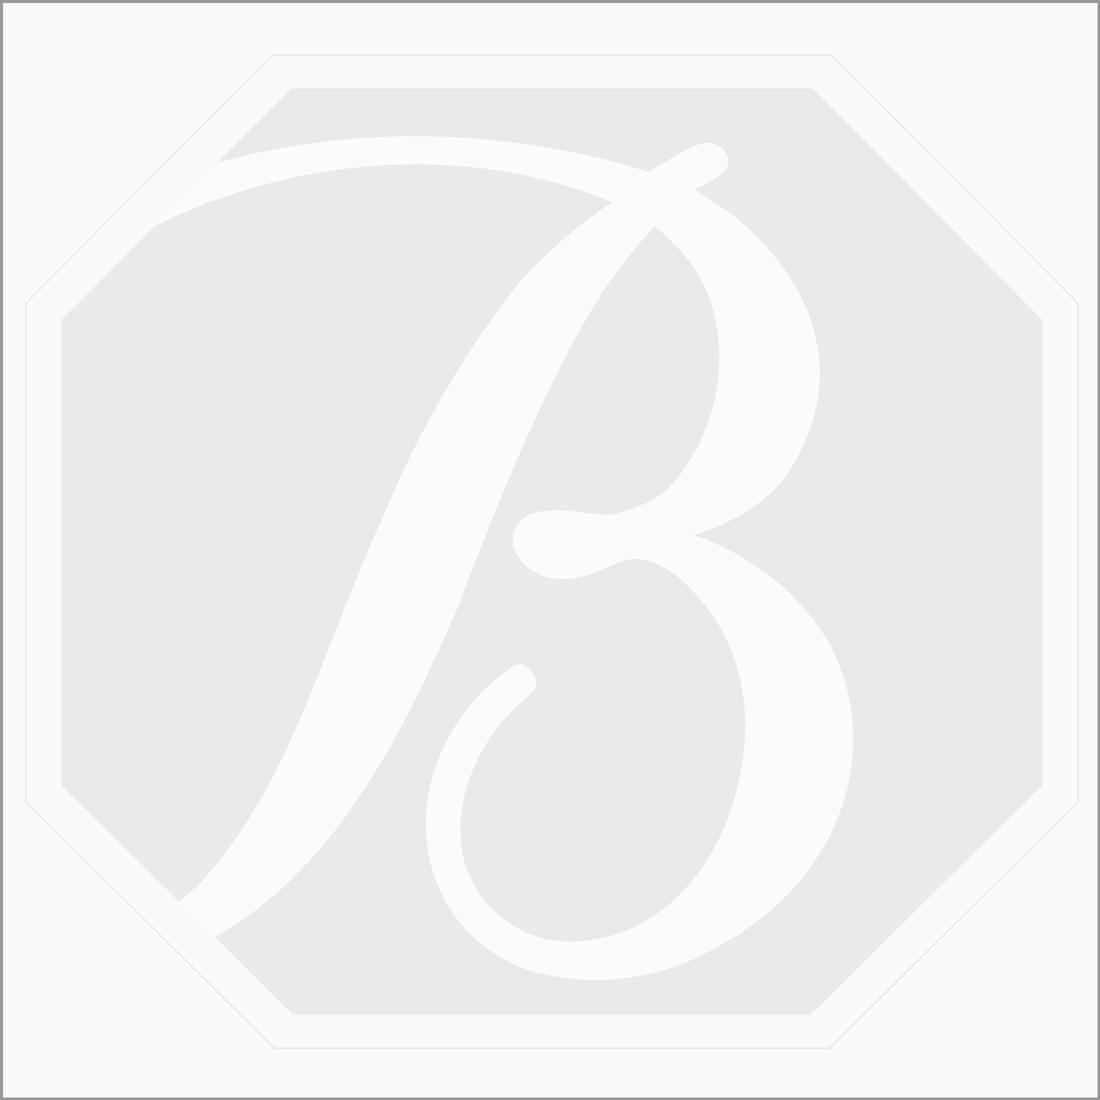 19 x 16.70 mm - Bi-Color Cat's Eye Tourmaline Oval Cabochon - 1 Pieces - 30.87 carats (ToCab1089)